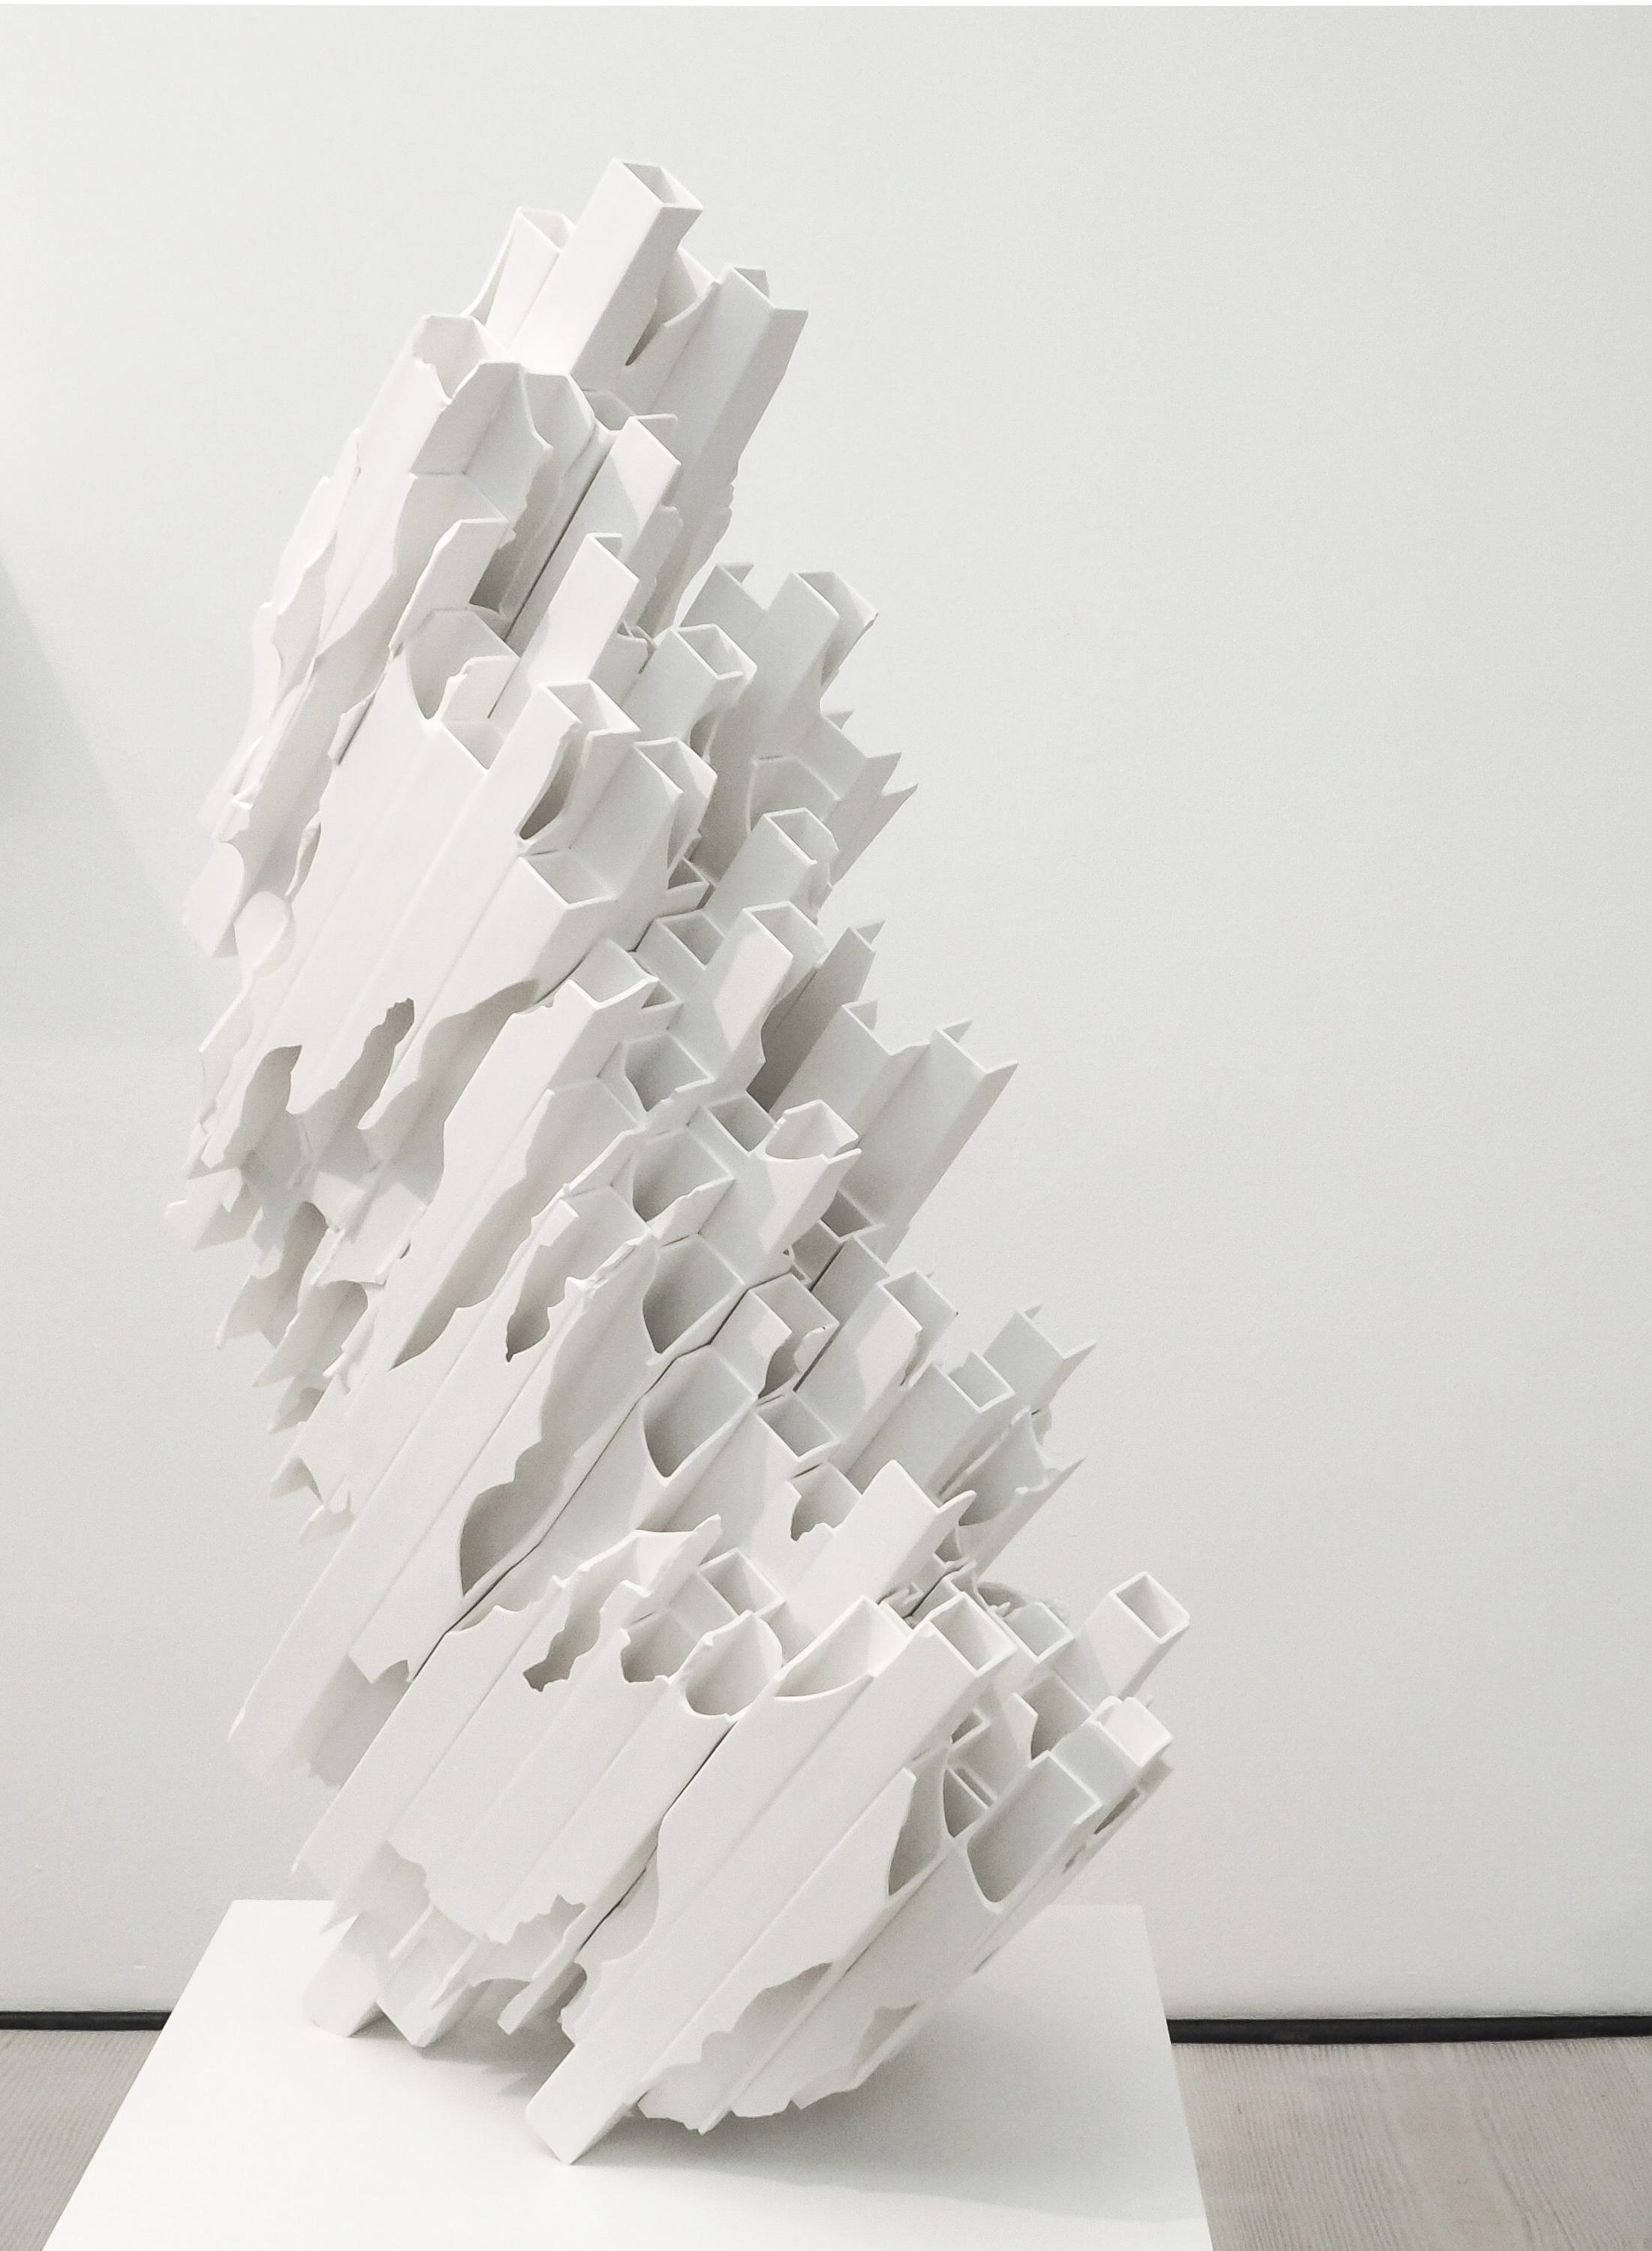 Modern remains by Japanese artist Kouzo Takeuchi